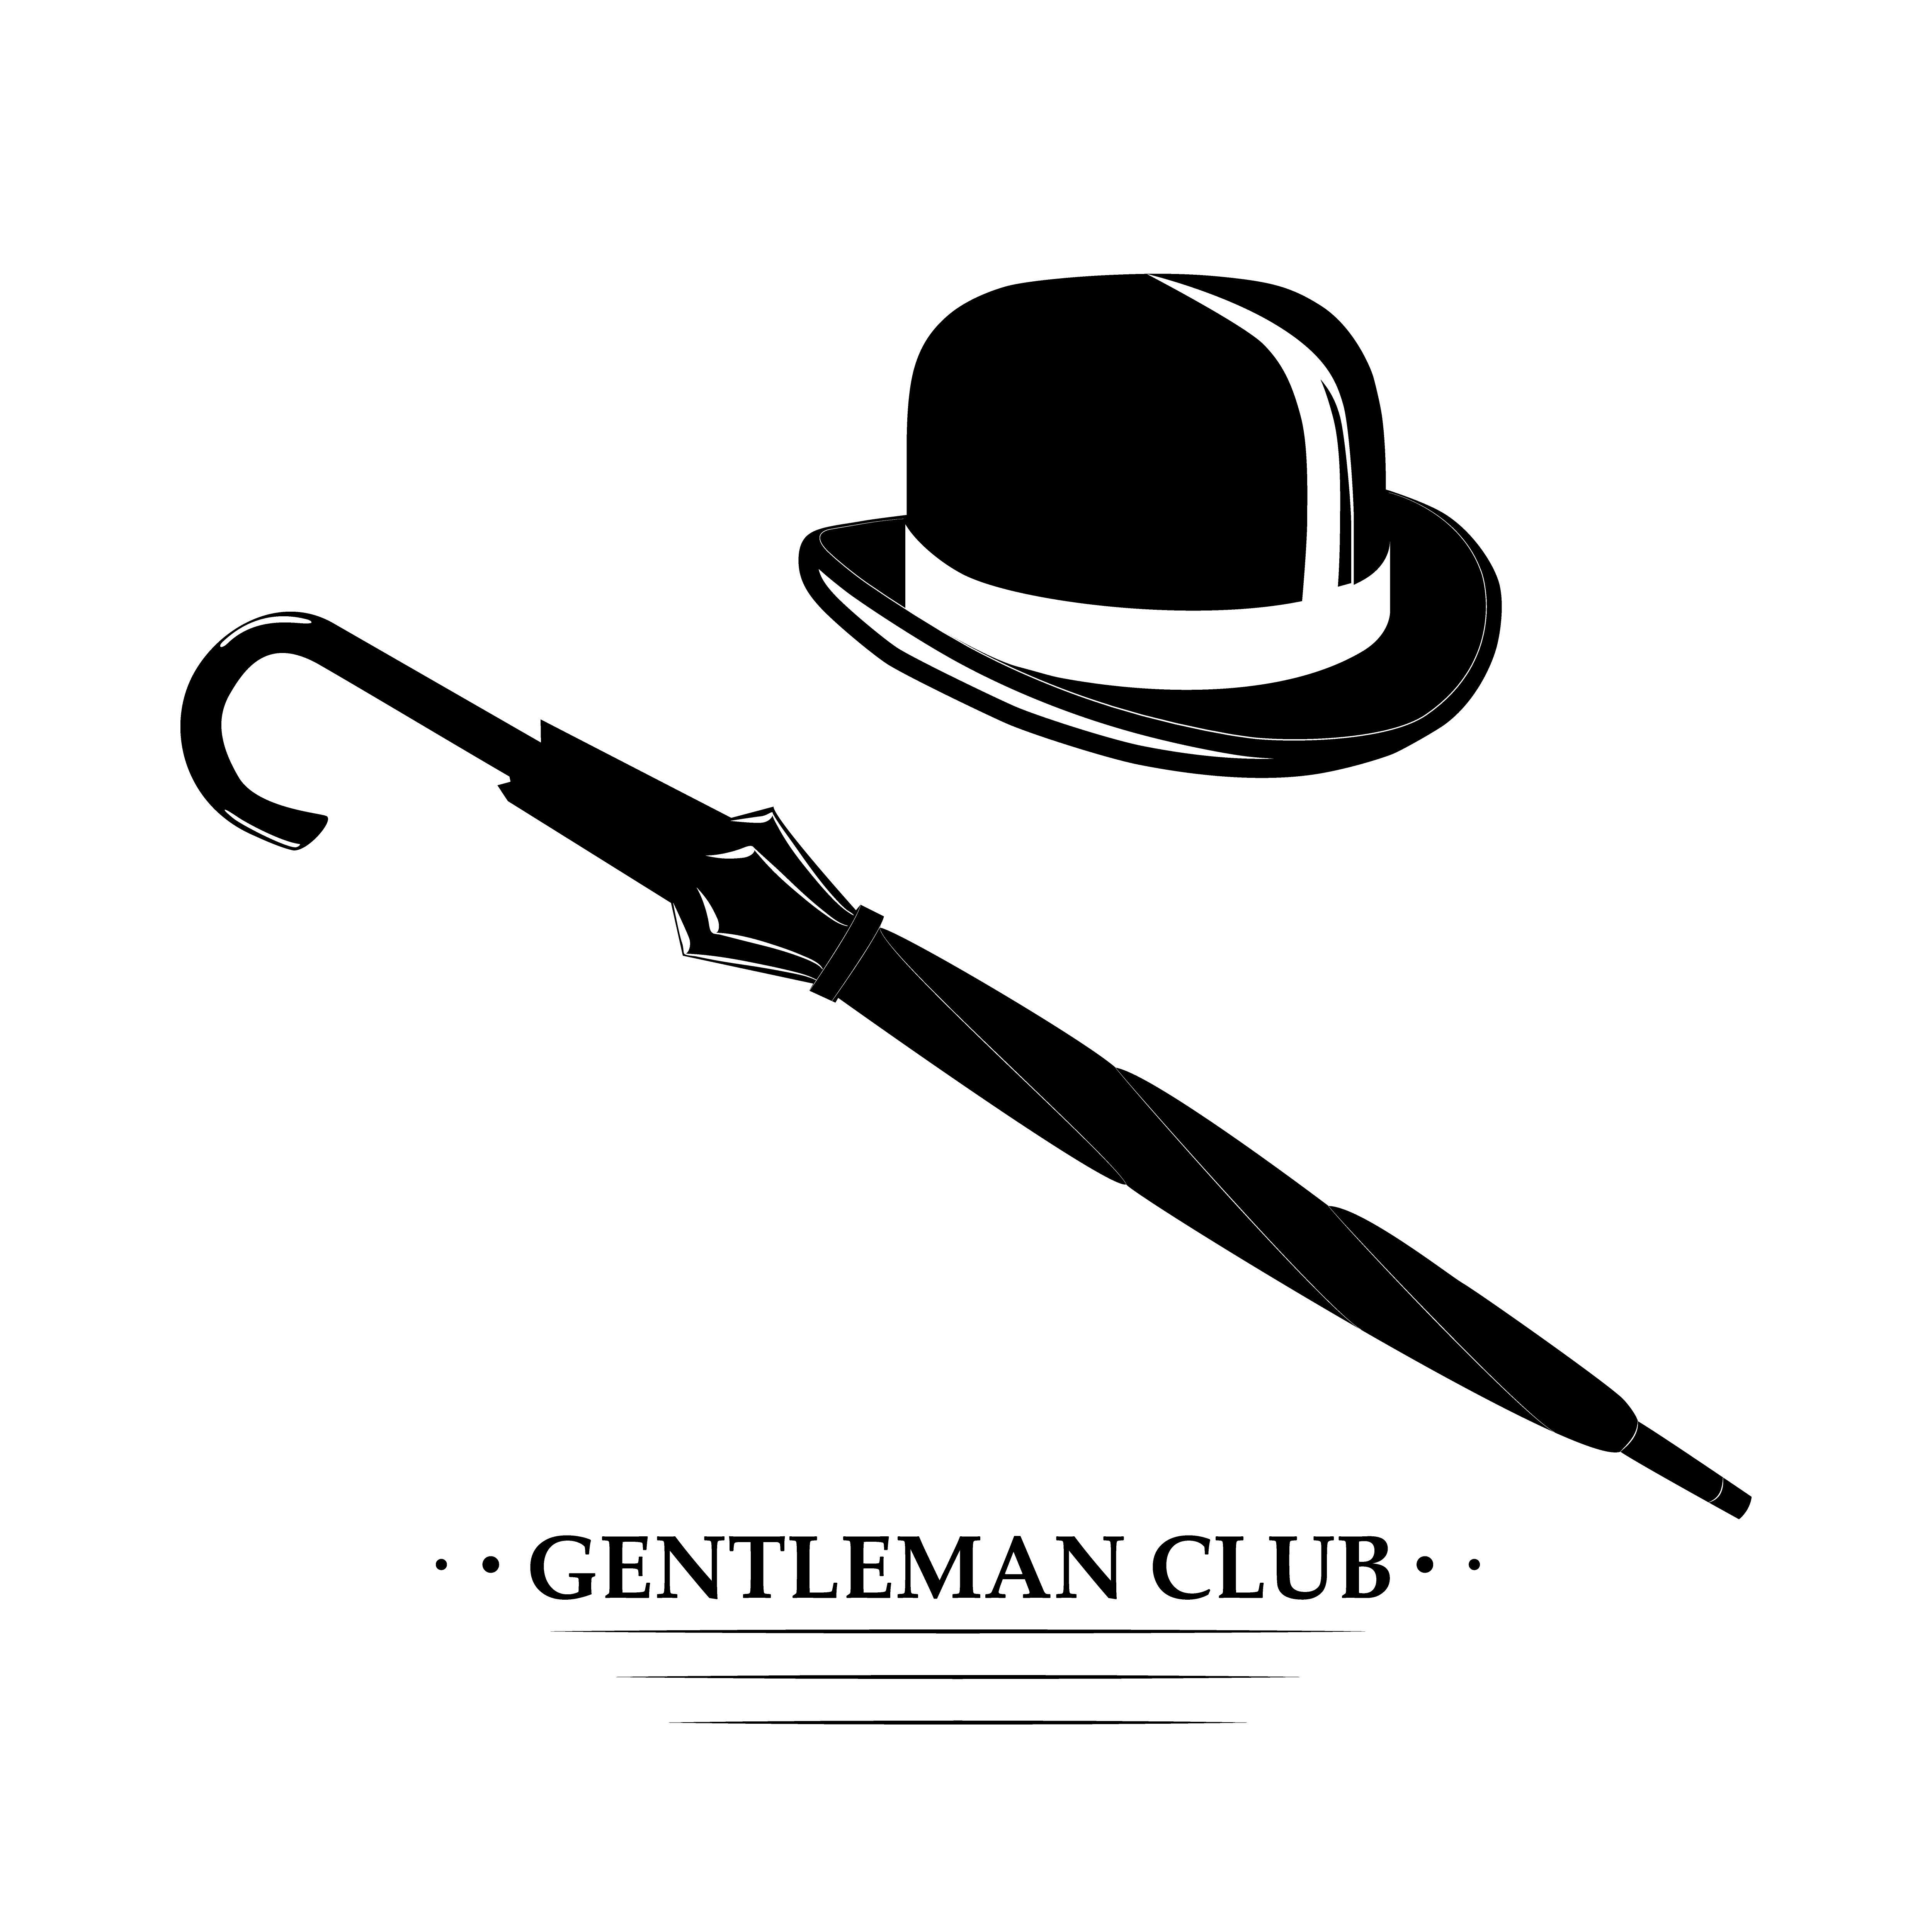 Vintage Gentlemen Elegance Logo Gentleman Gentlemen Hat Bowler Derby Top Hat Cylinder Headdress Headge Gentleman Vintage Gentleman Styled Stock Photos